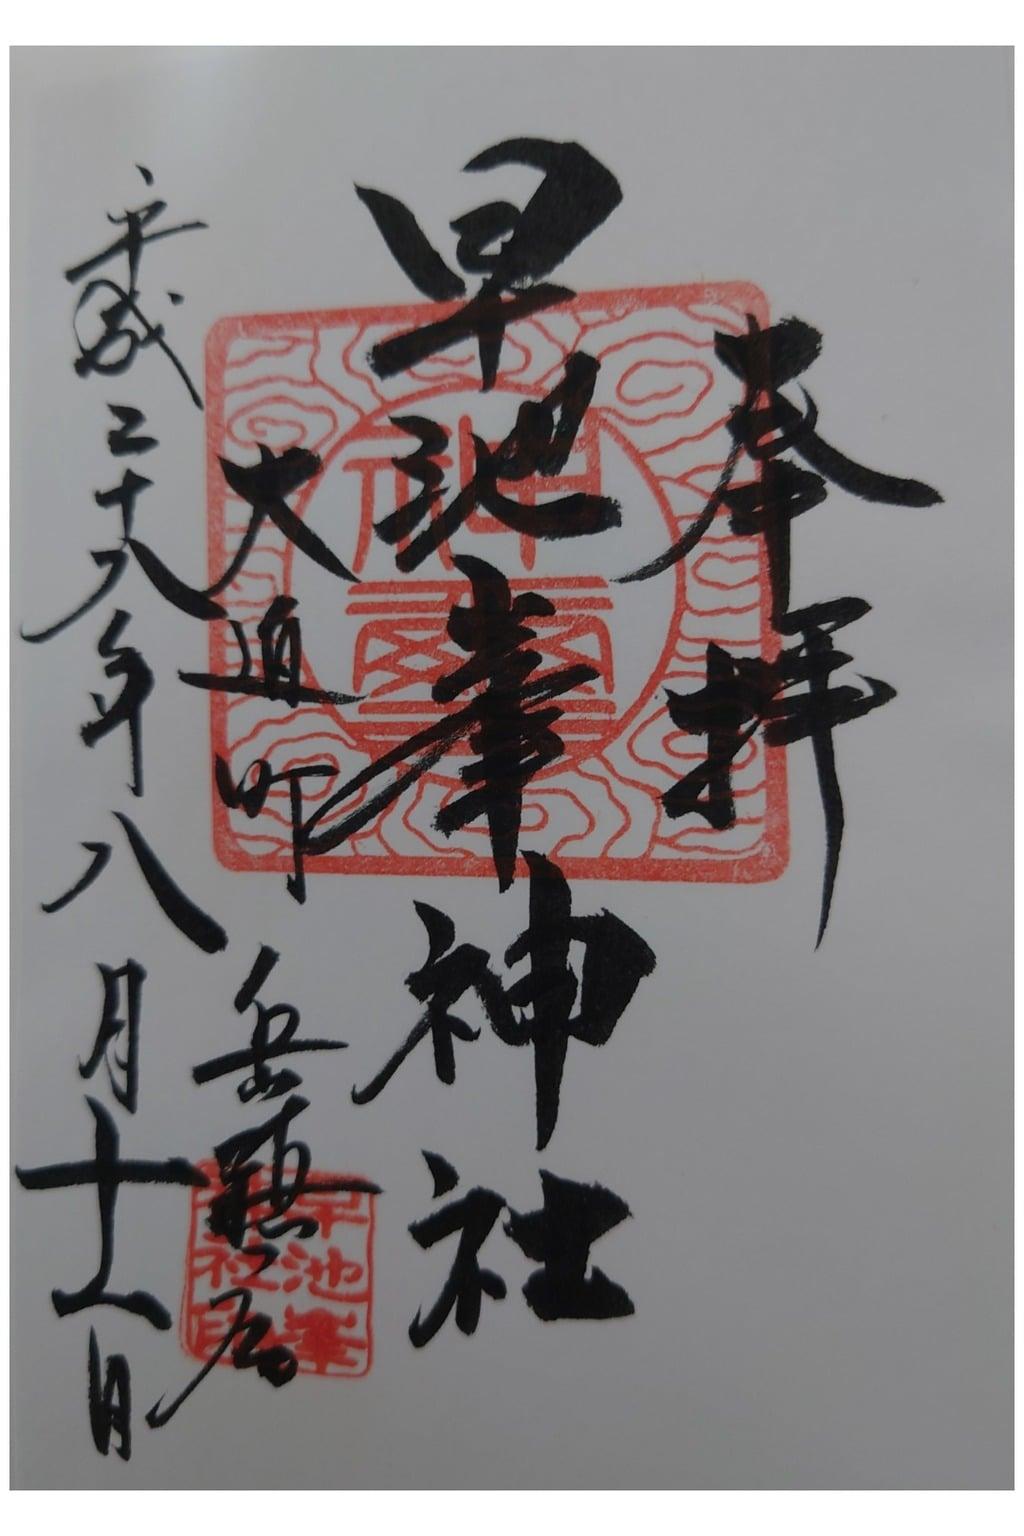 早池峰神社の御朱印